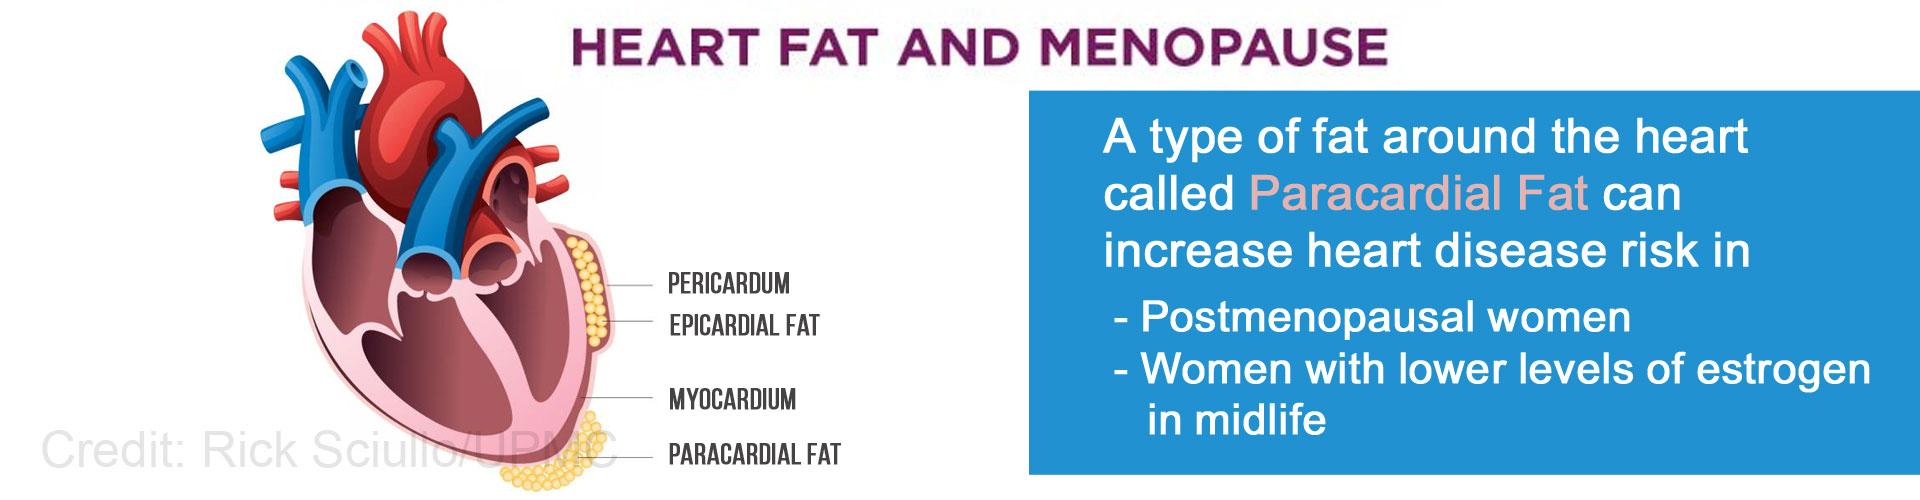 Heart Fat Associated With Higher Risk of Heart Disease in Postmenopausal Women